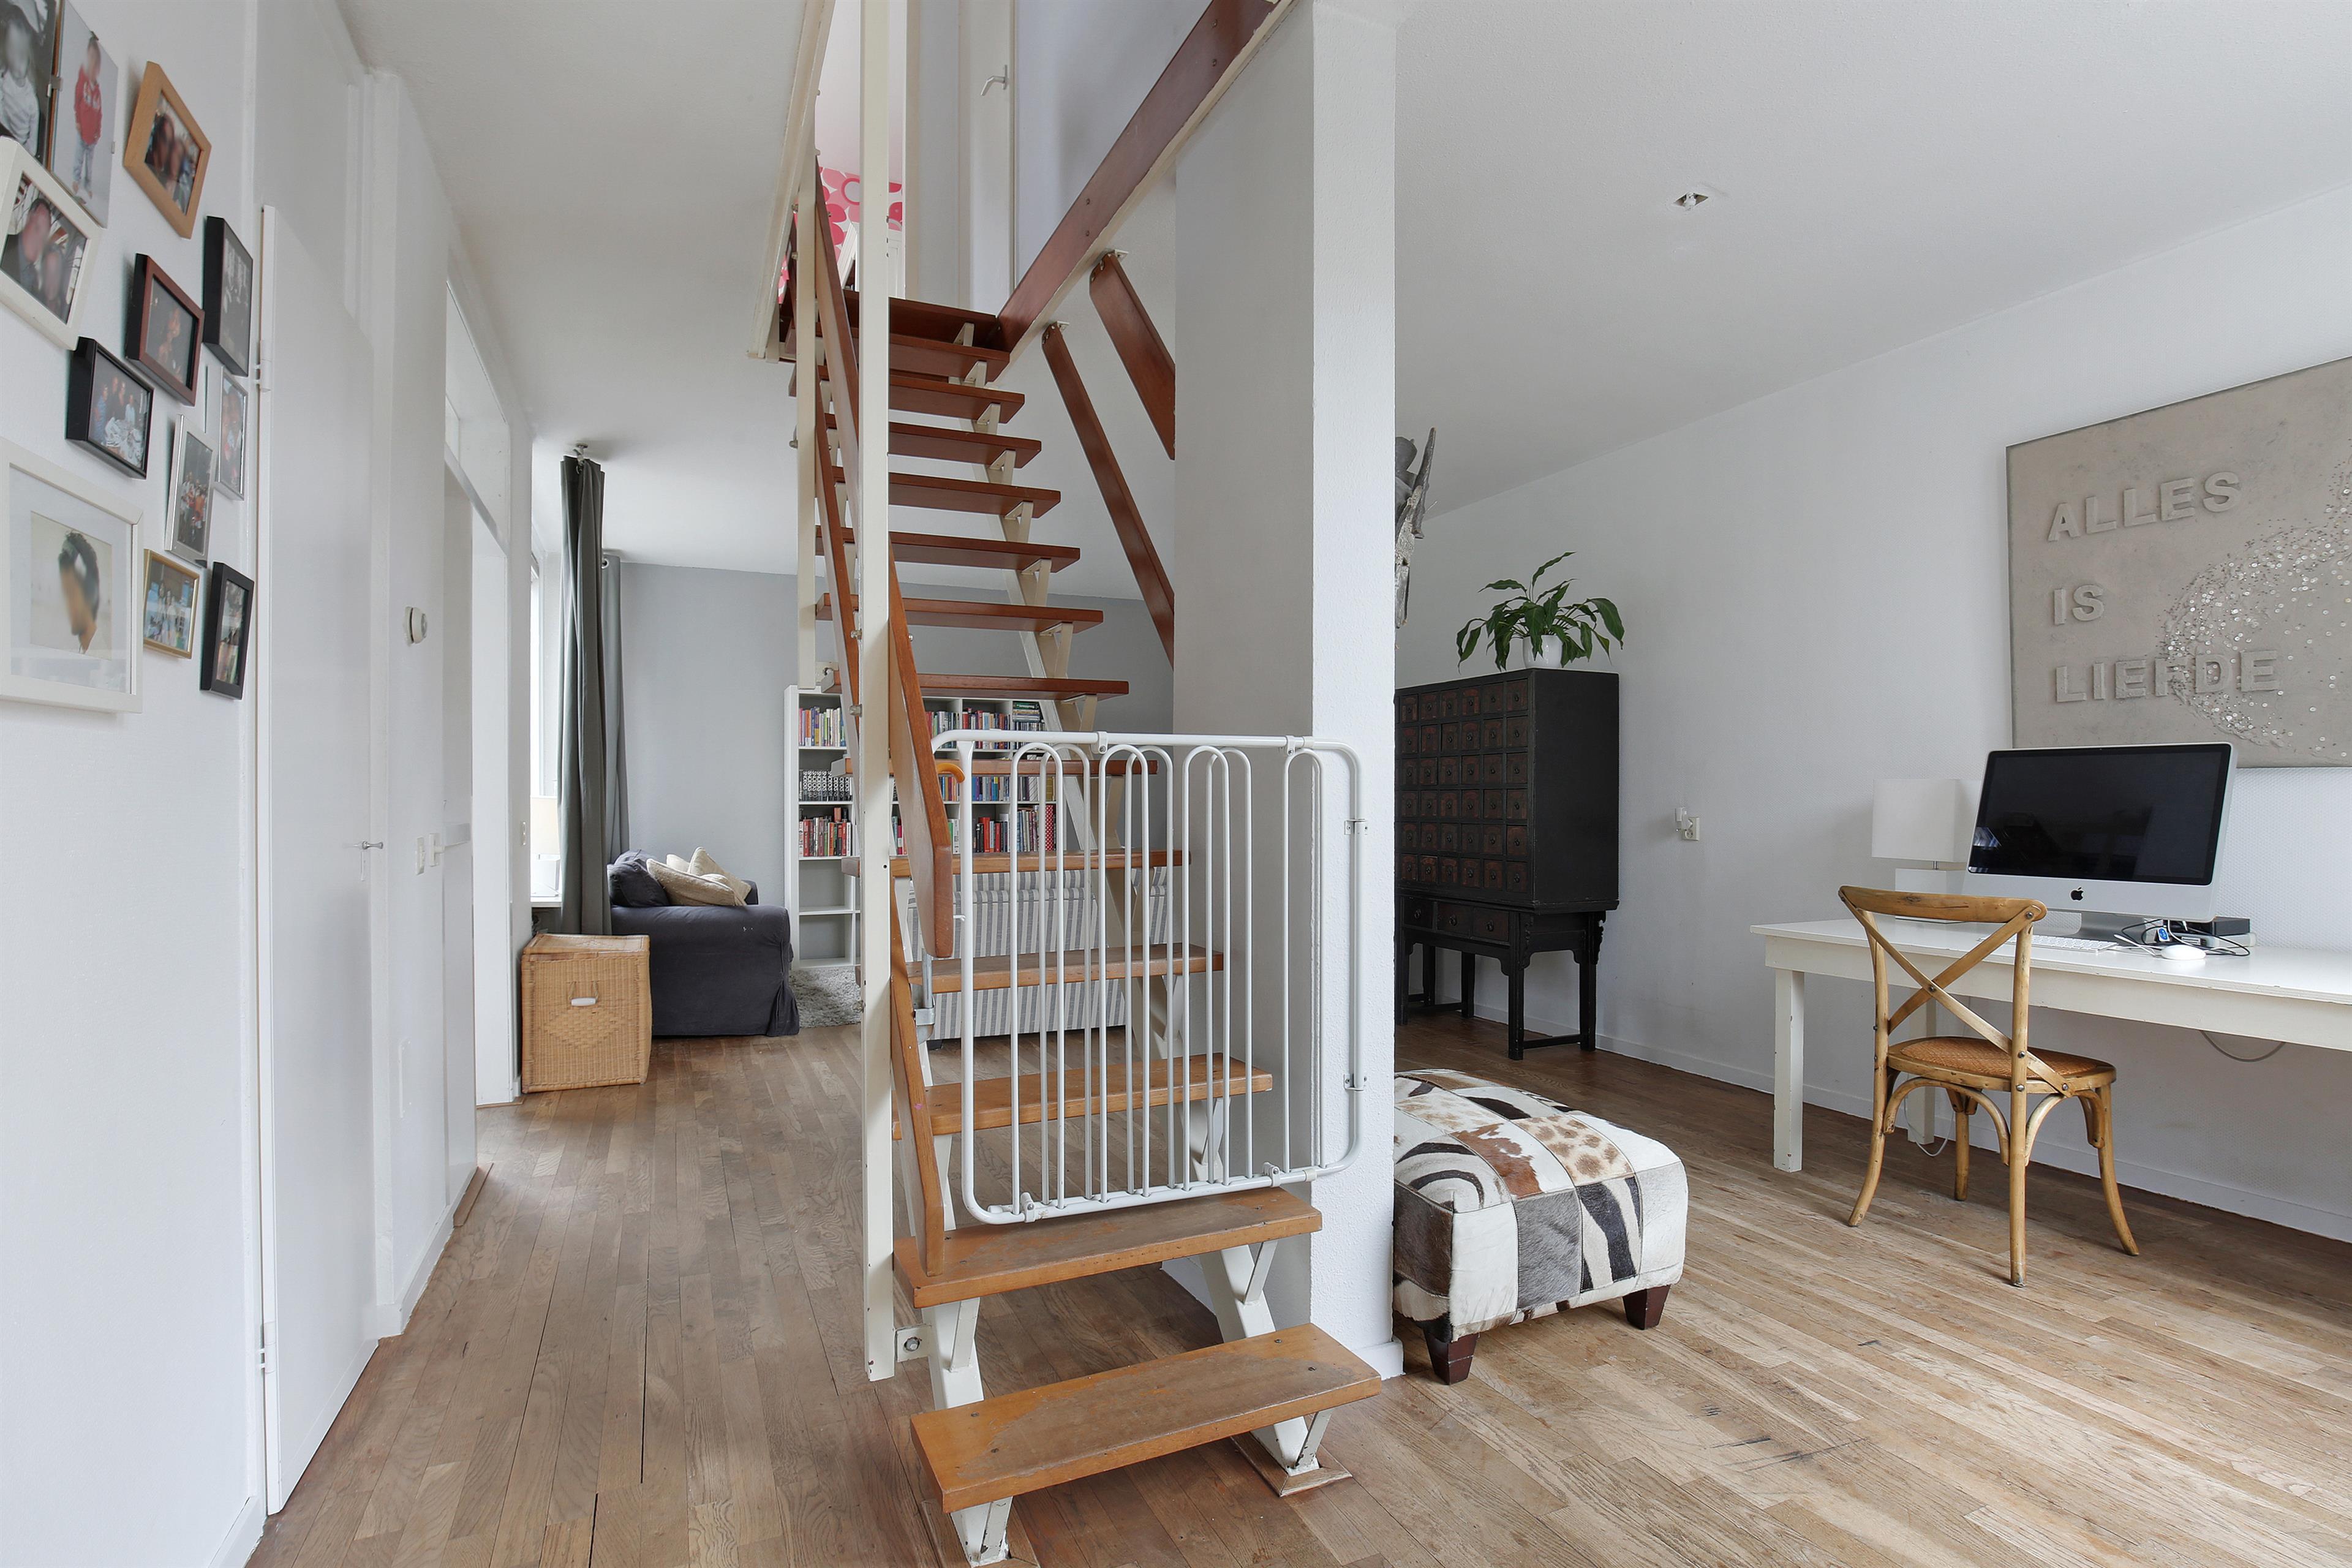 Te koop looiersdreef 694 apeldoorn hendriks makelaardij - Midden kamer trap ...